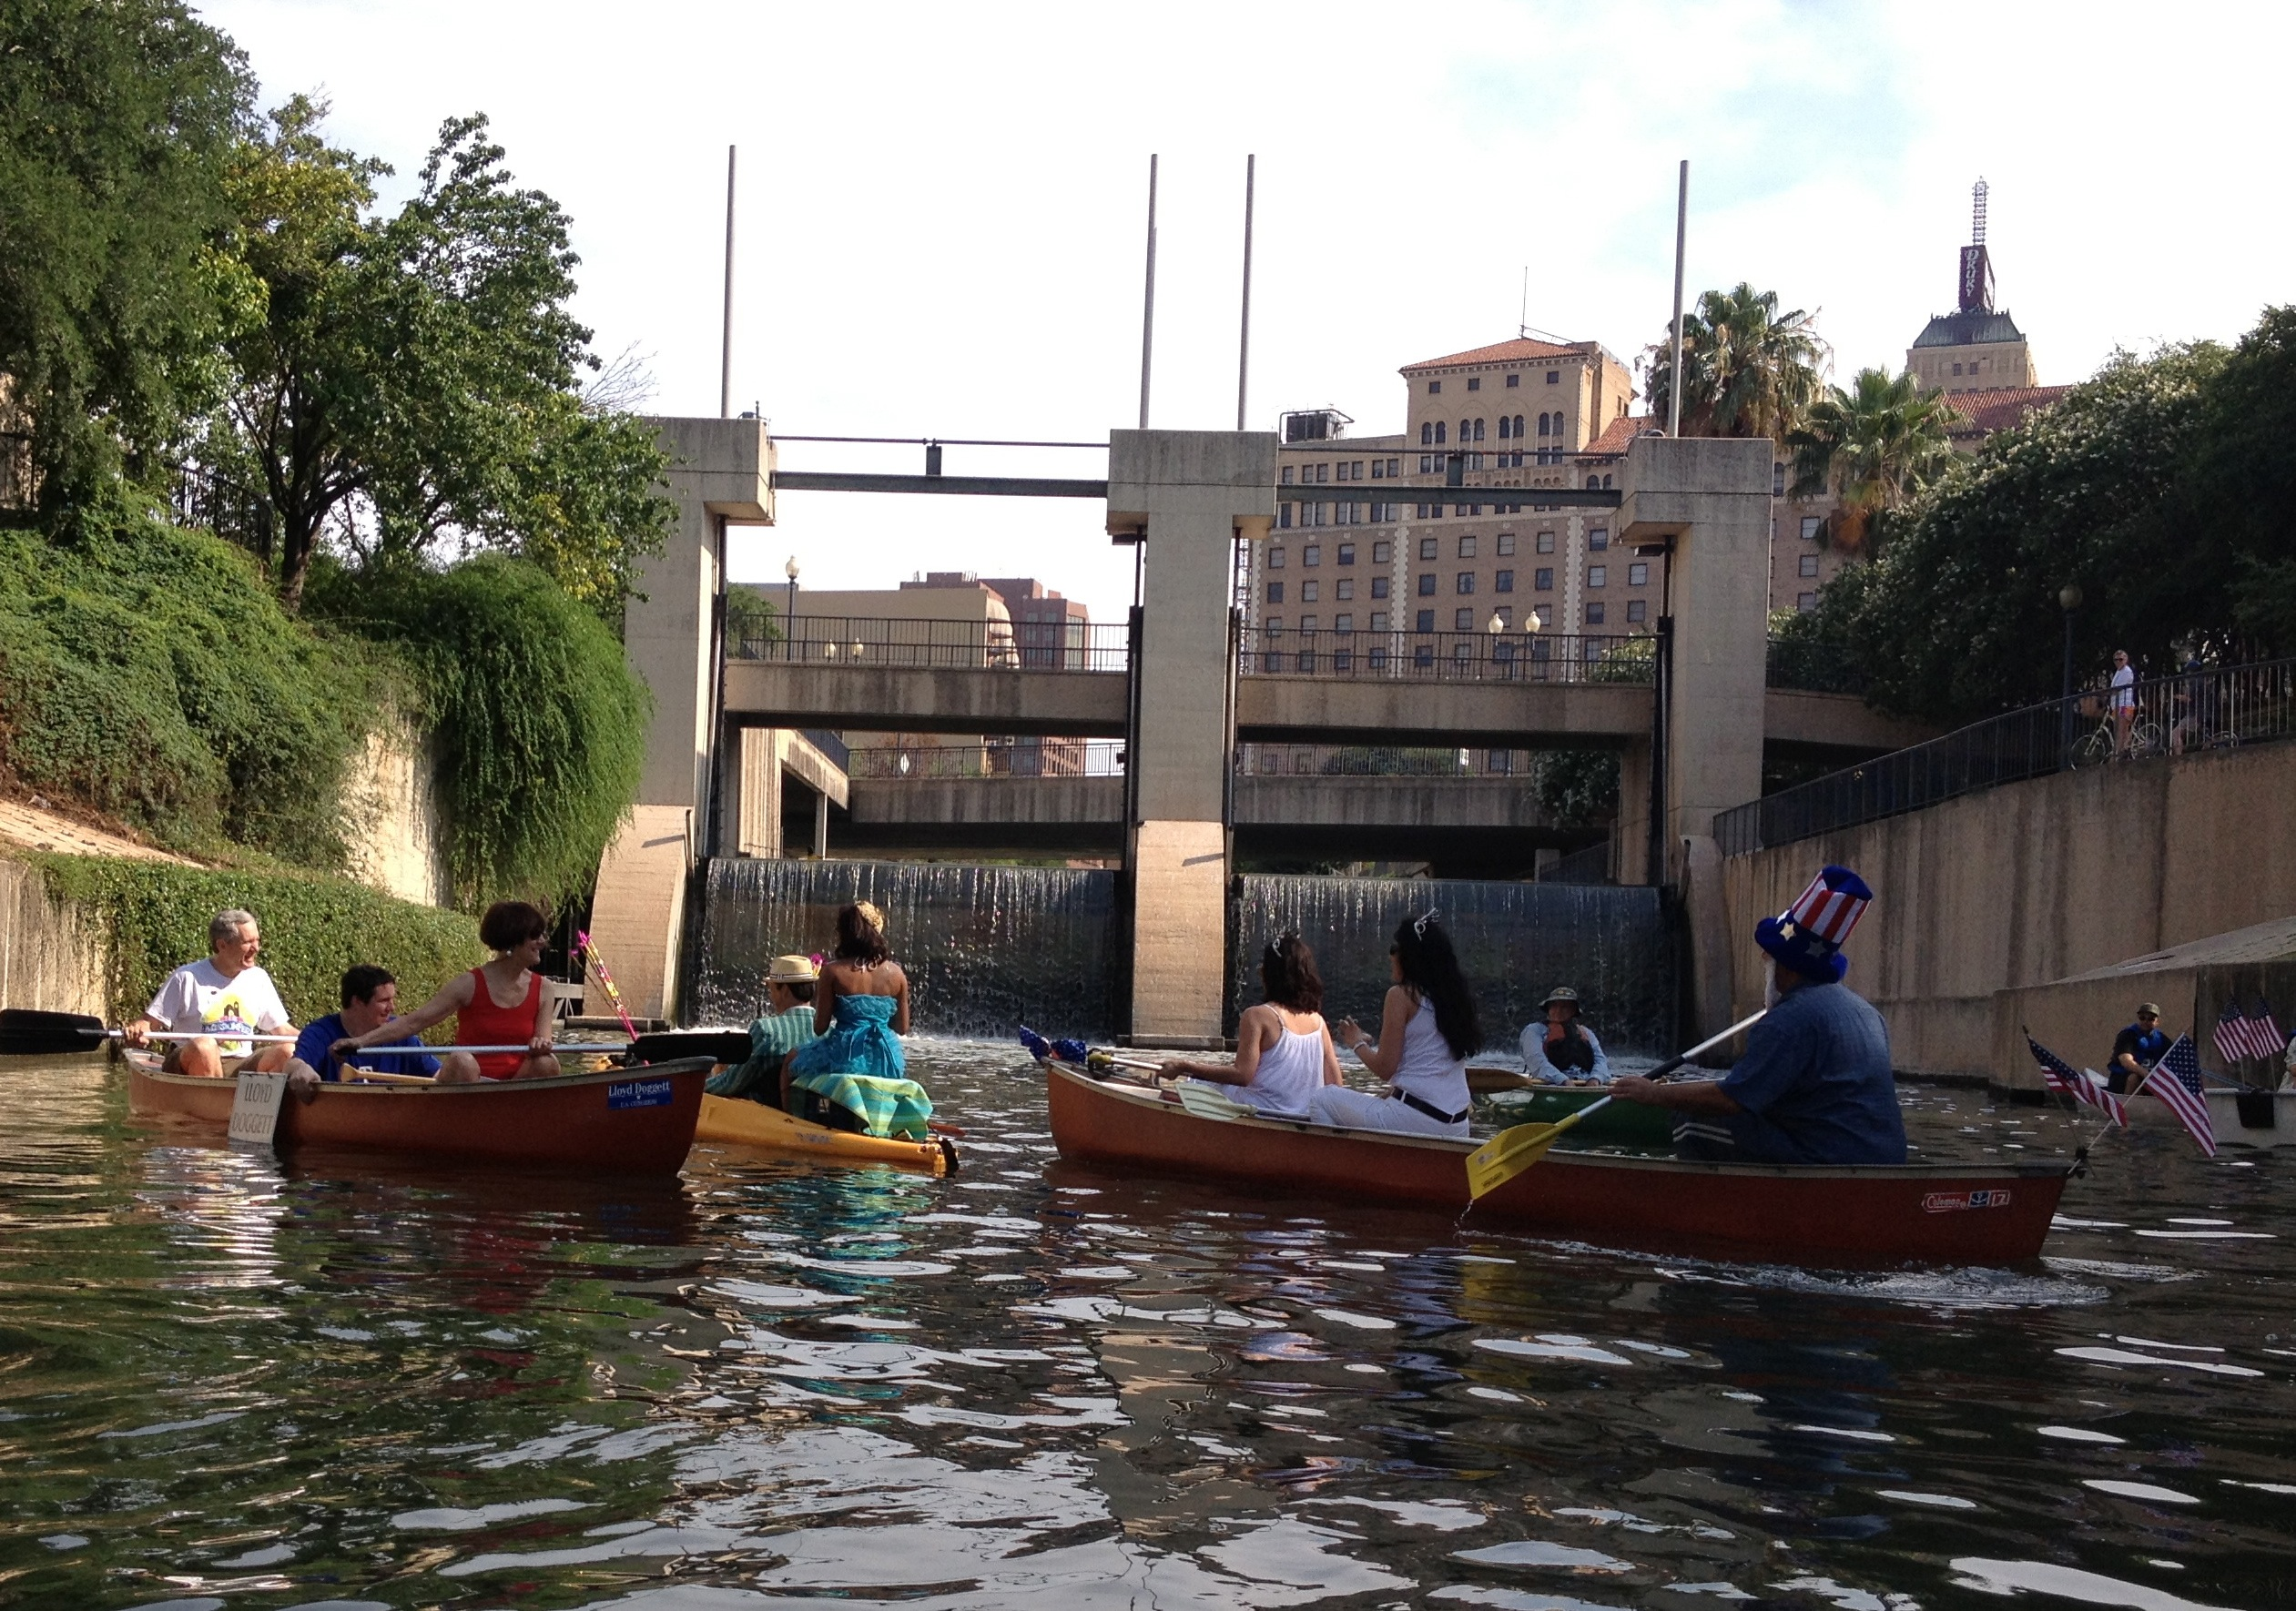 King William Regata paddlers floating in the San Antonio River at the Nueva Street Bridge & Dam. Photo by Robert Rivard.